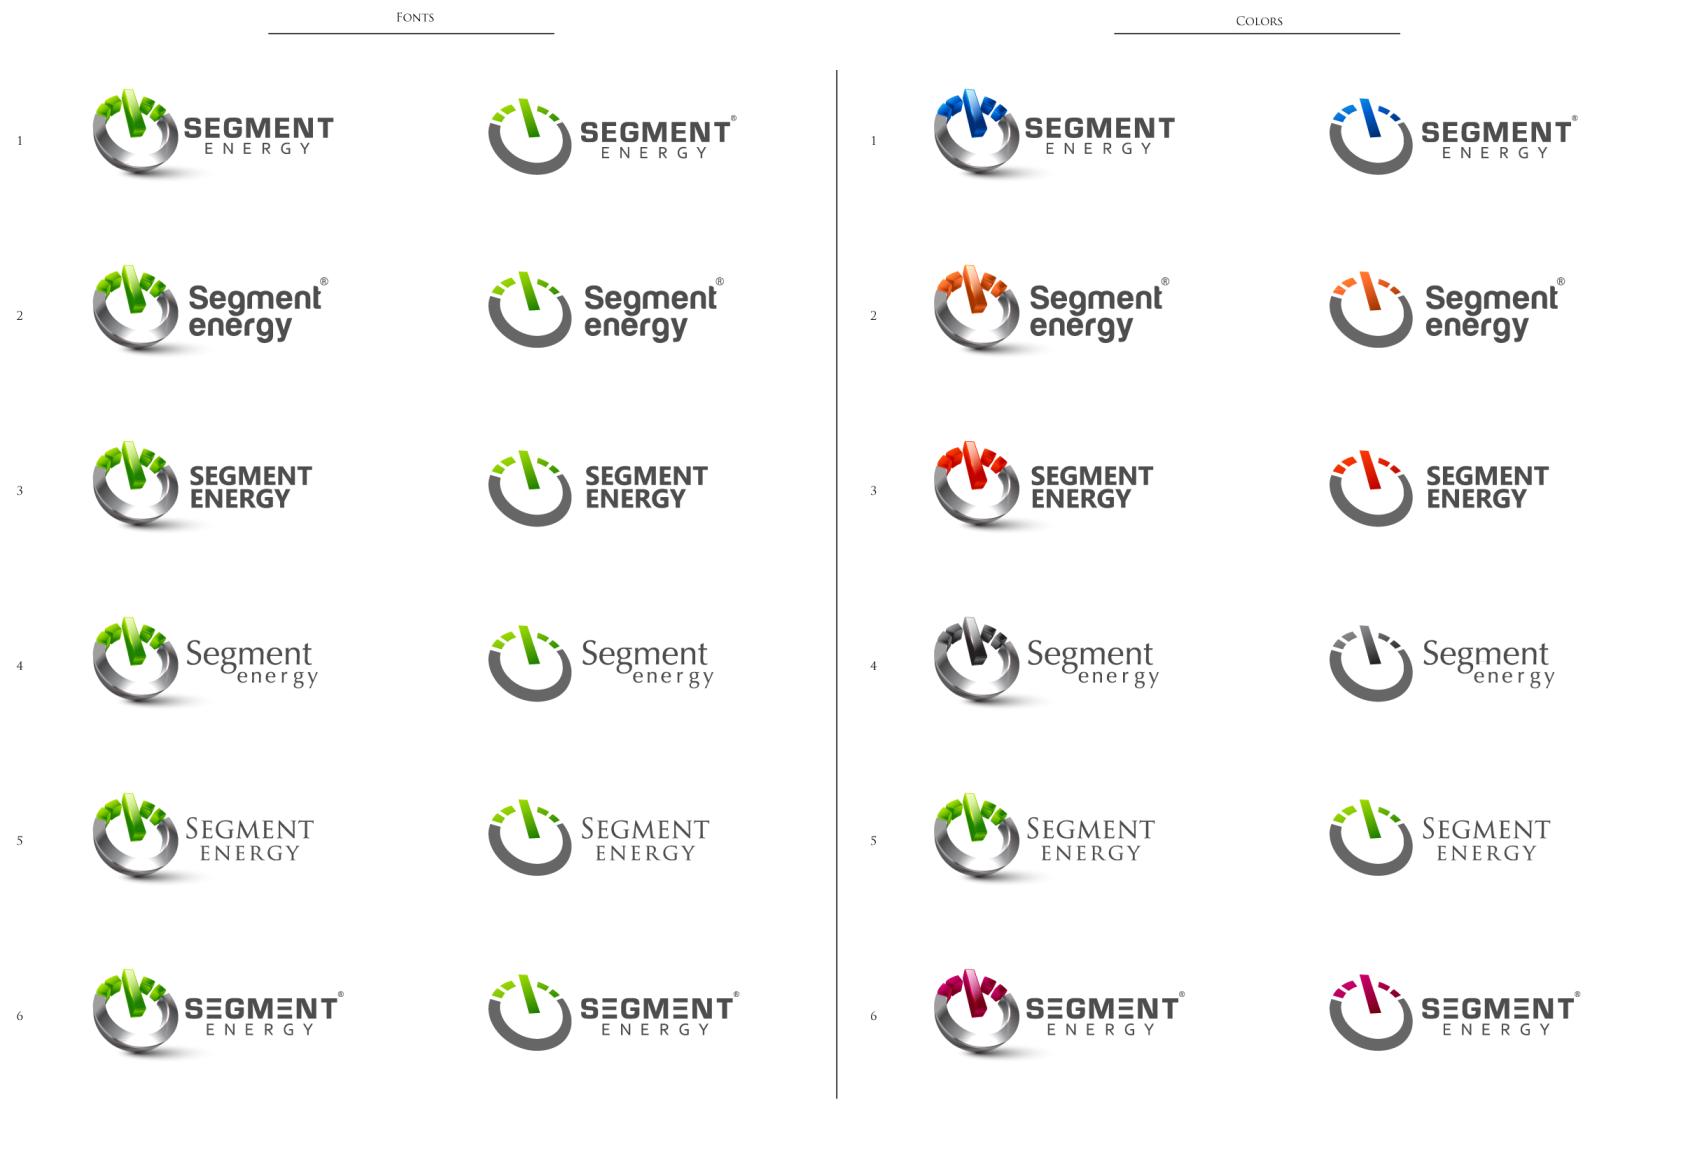 Segment Energy needs a new logo